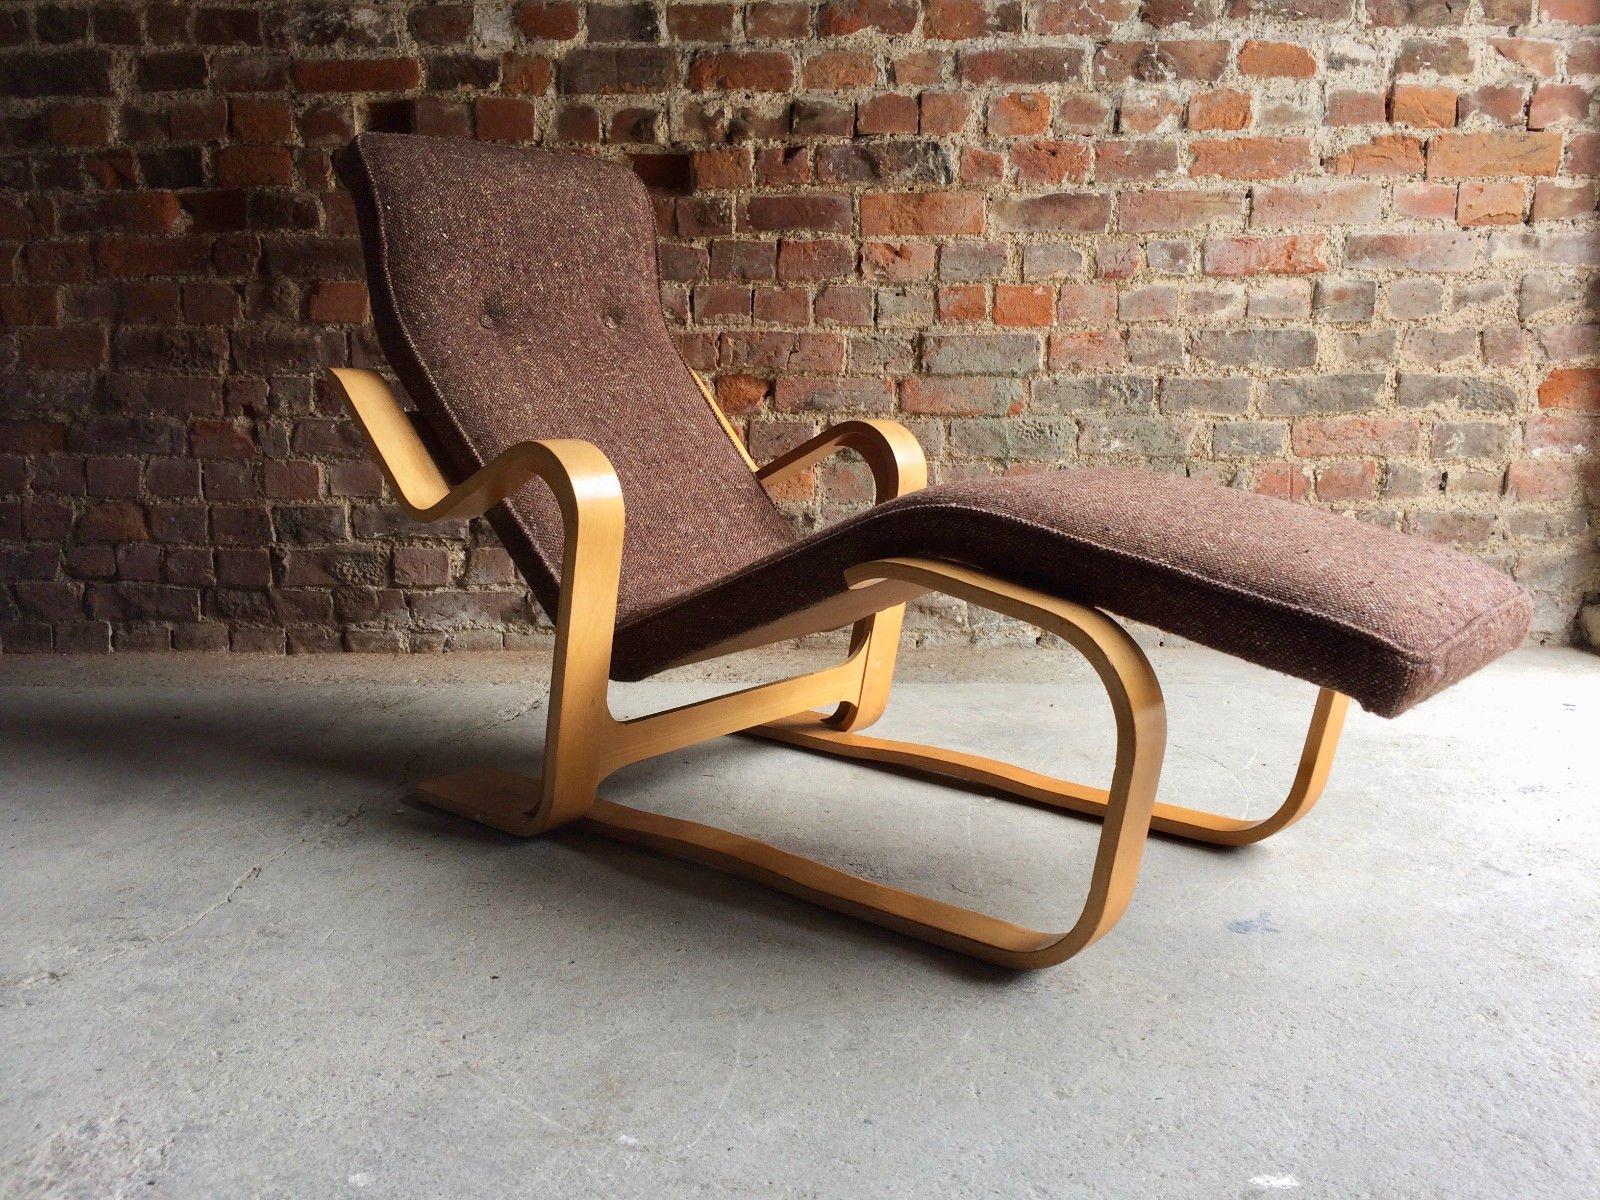 bauhaus chaise lounge von marcel breuer f r knoll 1970er. Black Bedroom Furniture Sets. Home Design Ideas